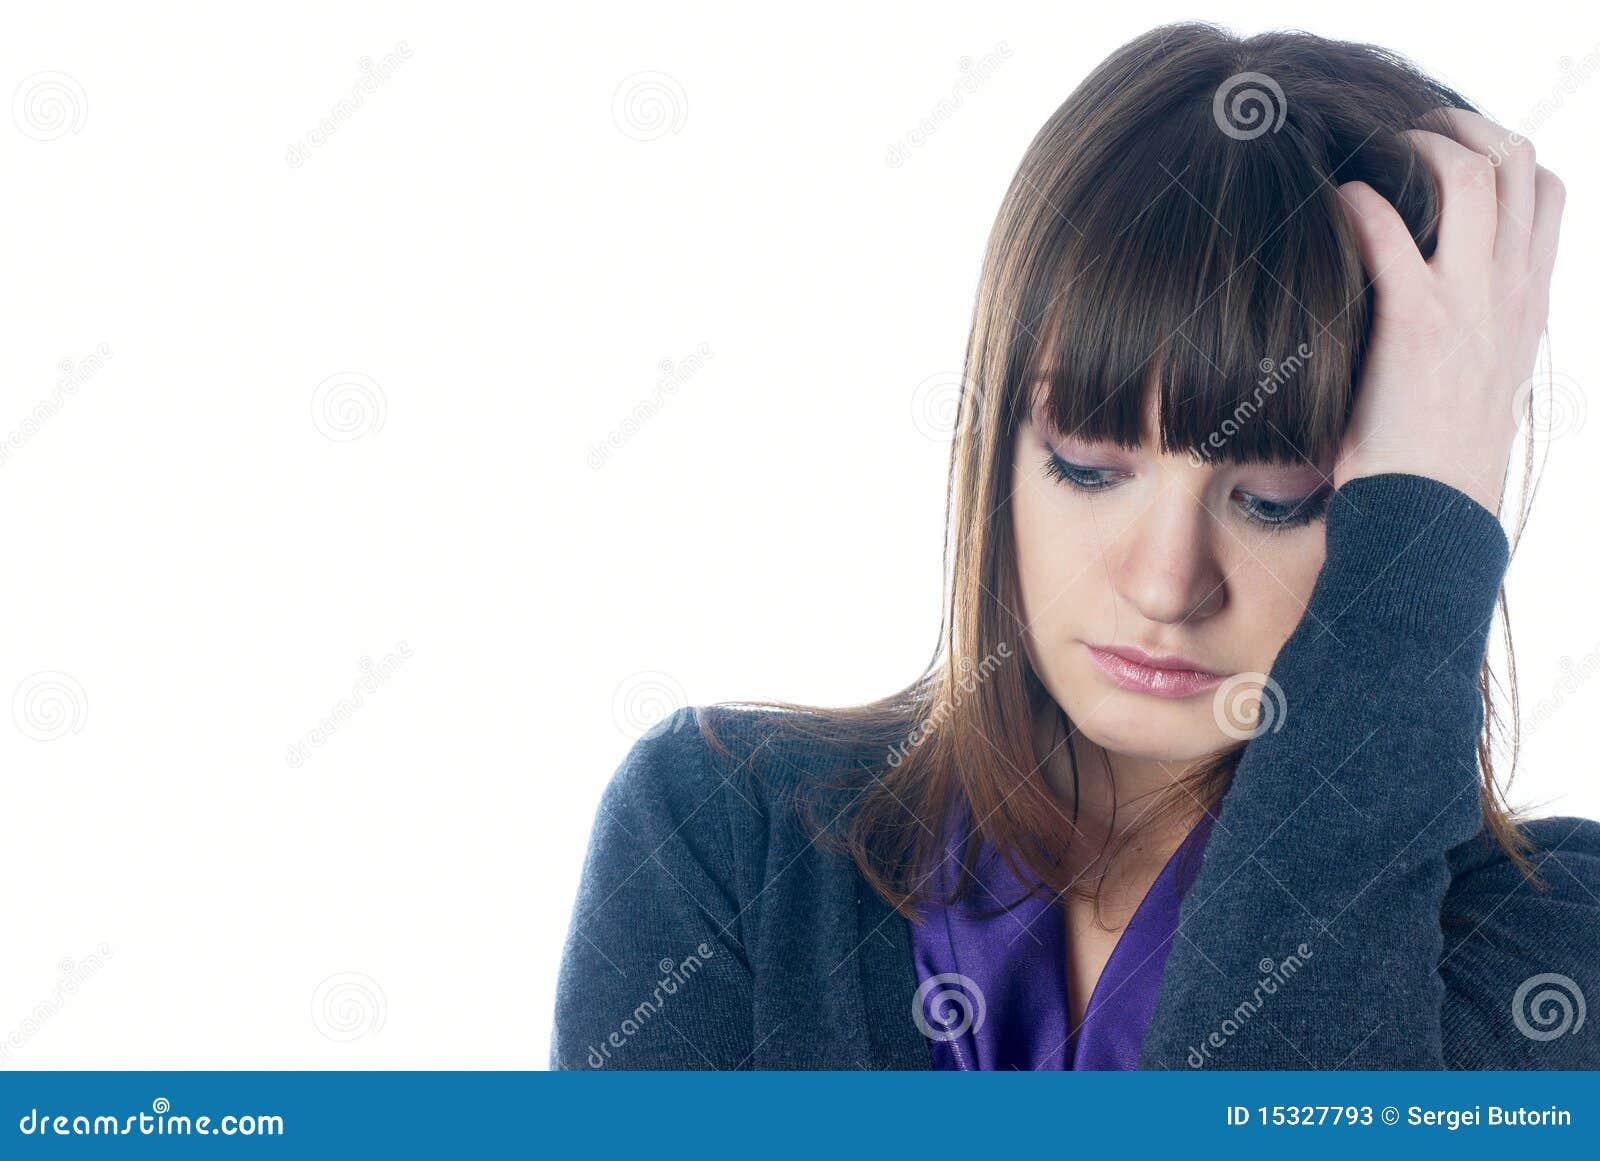 Картинки про боль девушки